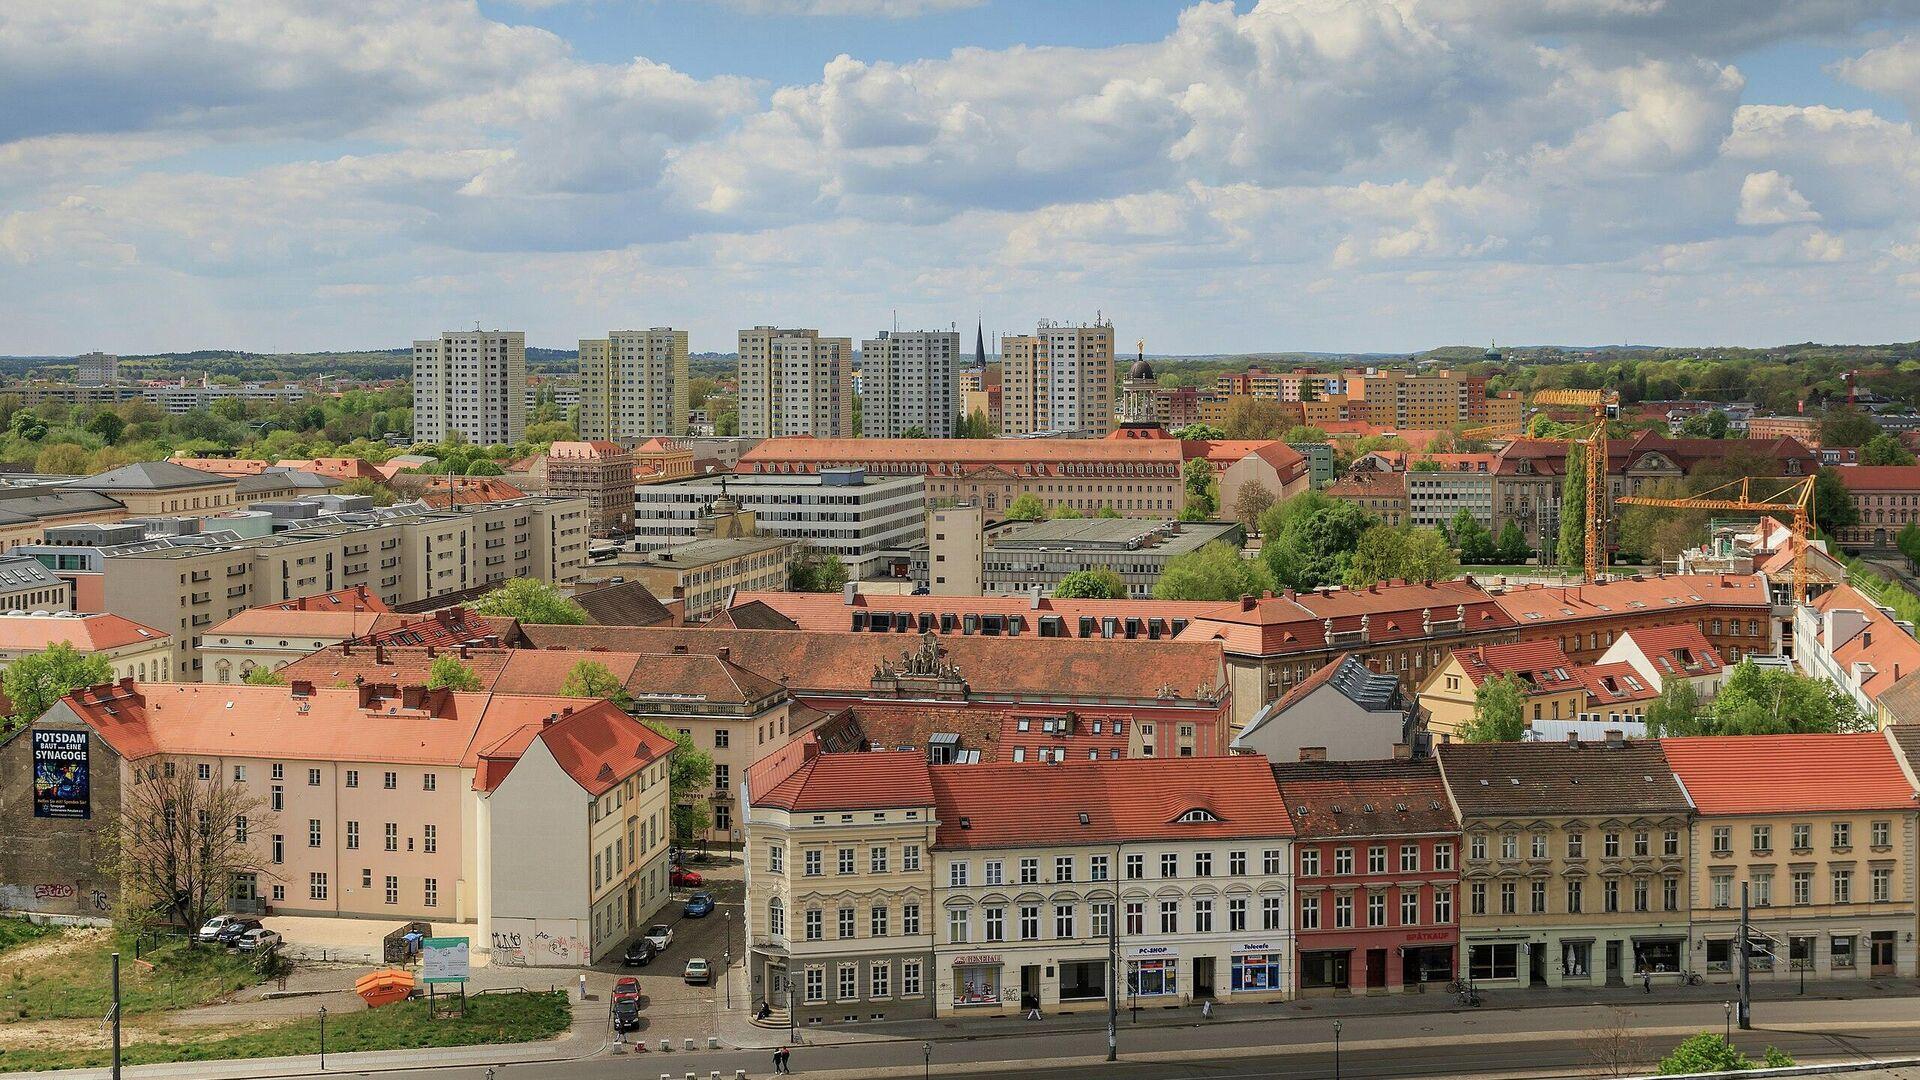 Potsdam (Archivbild) - SNA, 1920, 03.09.2021